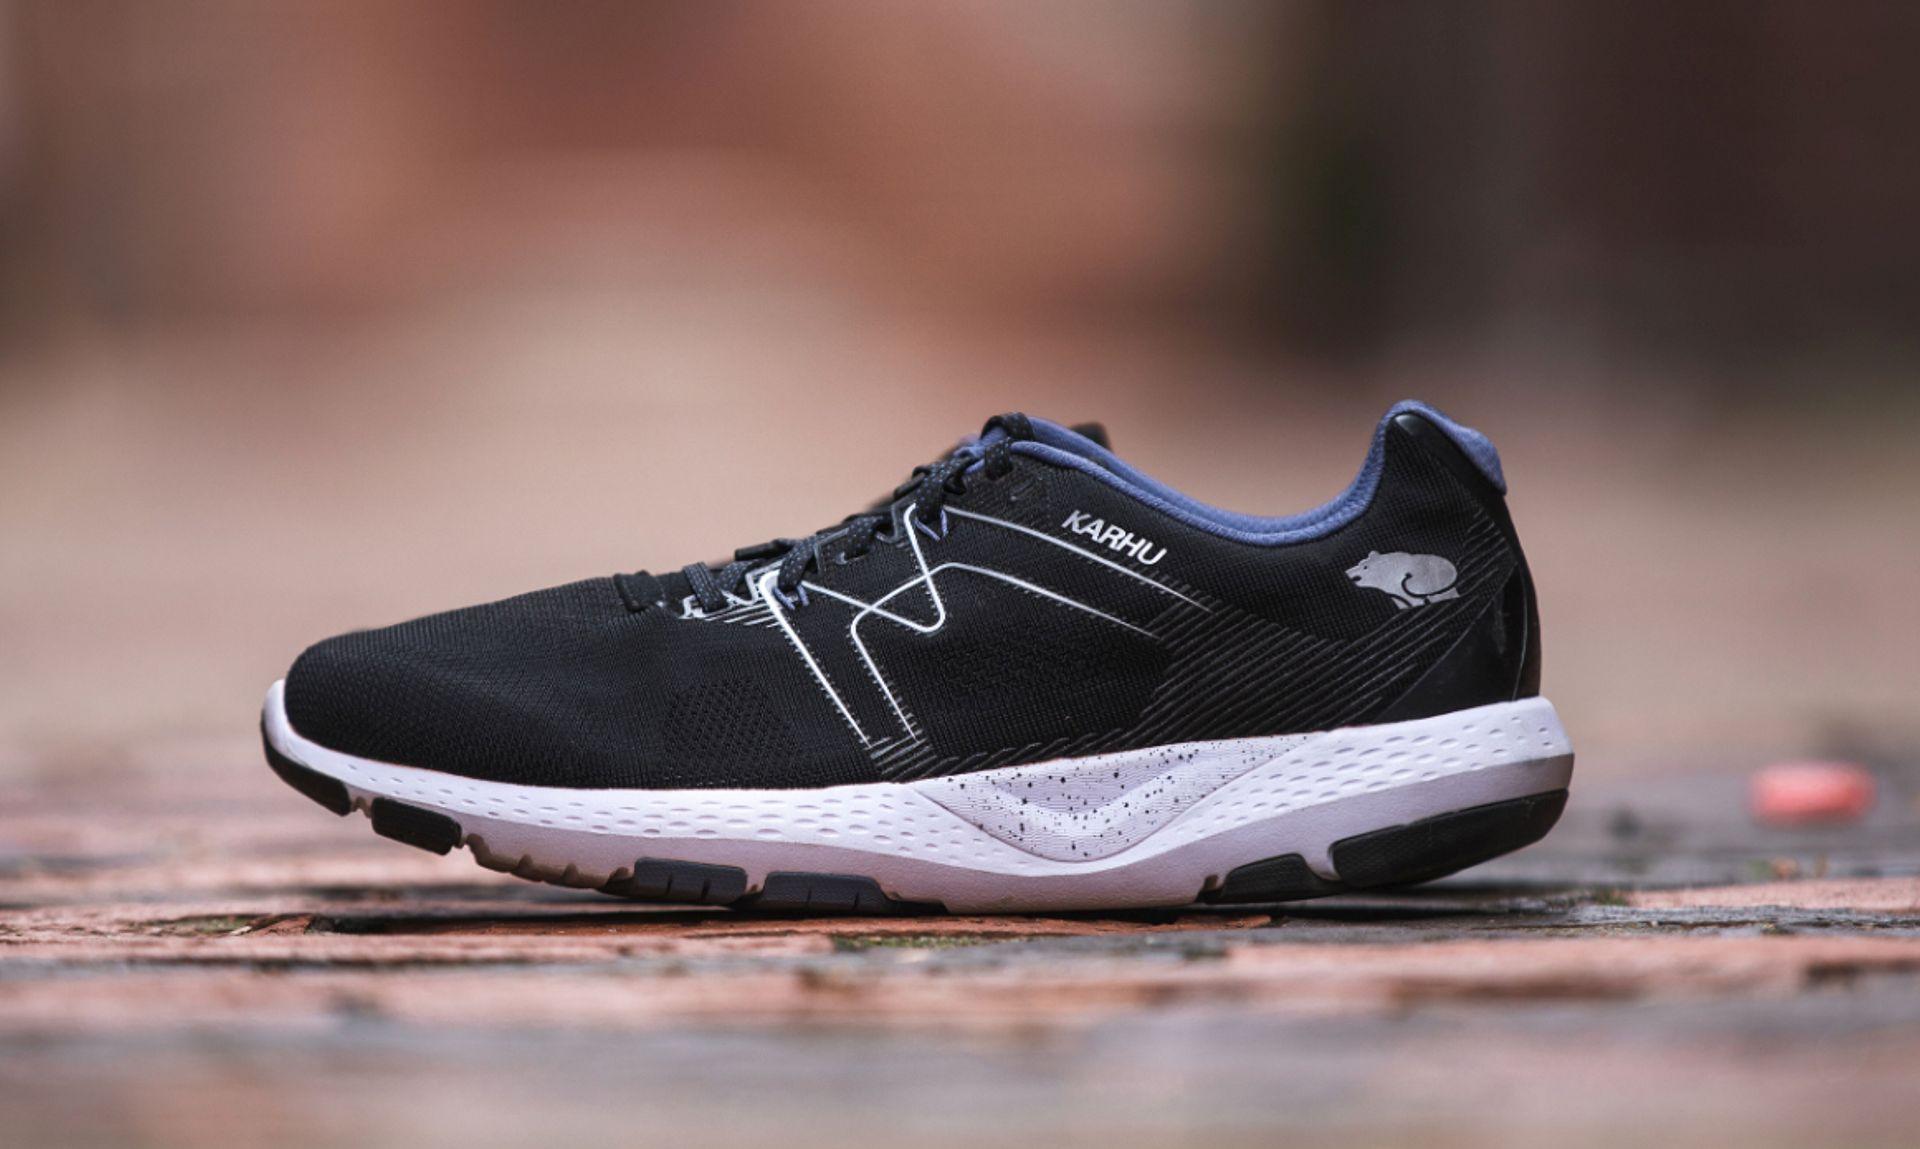 Best Karhu Running Shoes 2020 | Buyer's